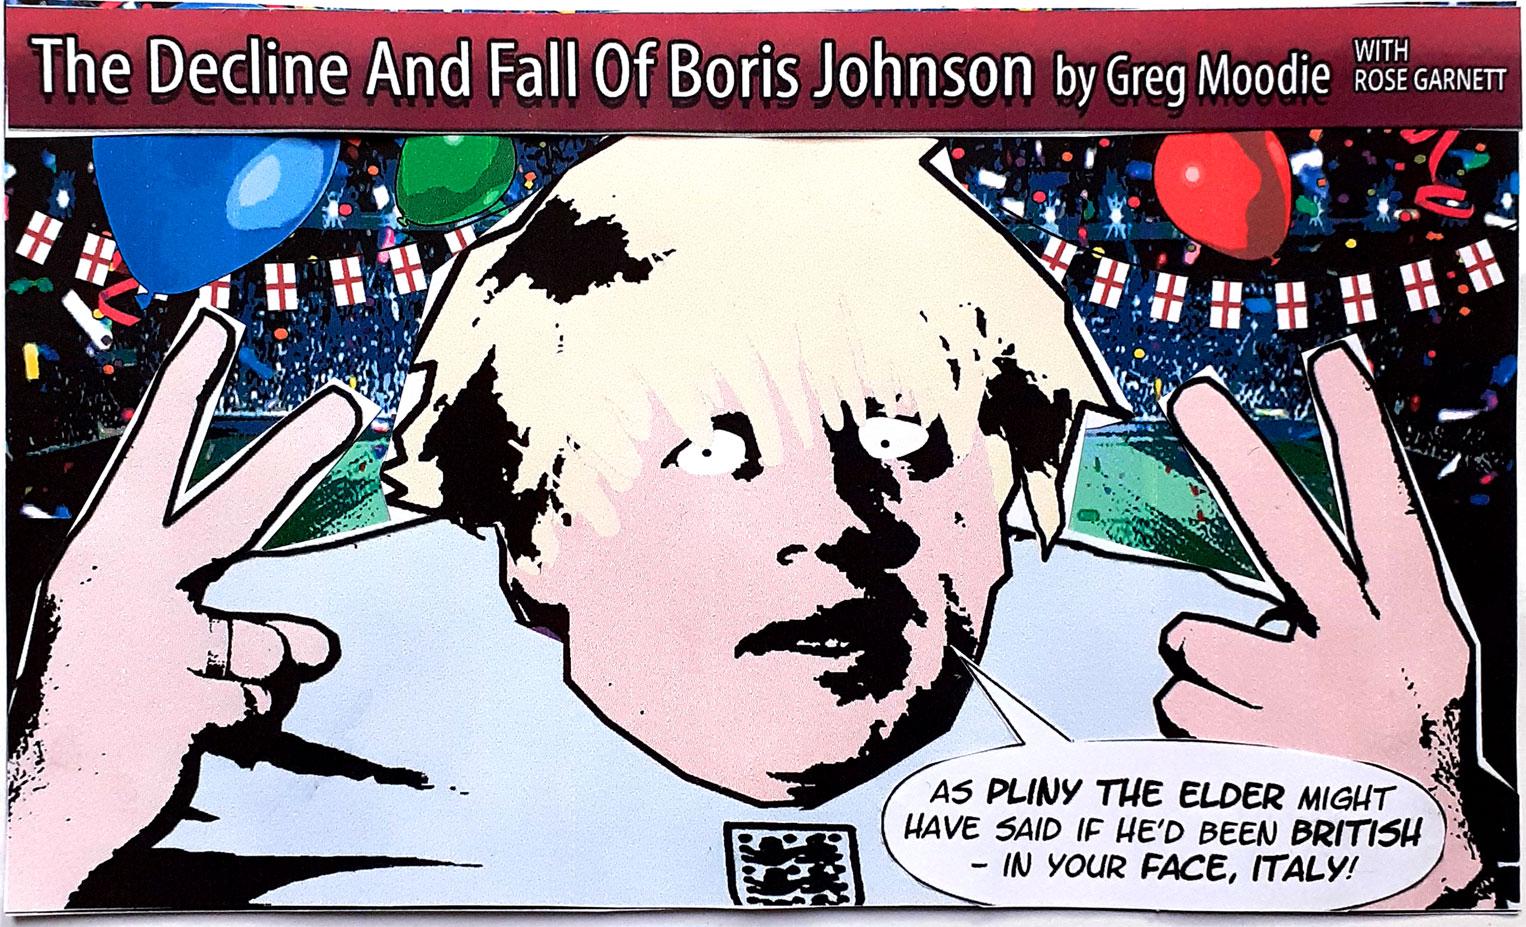 The Decline And Fall Of Boris Johnson